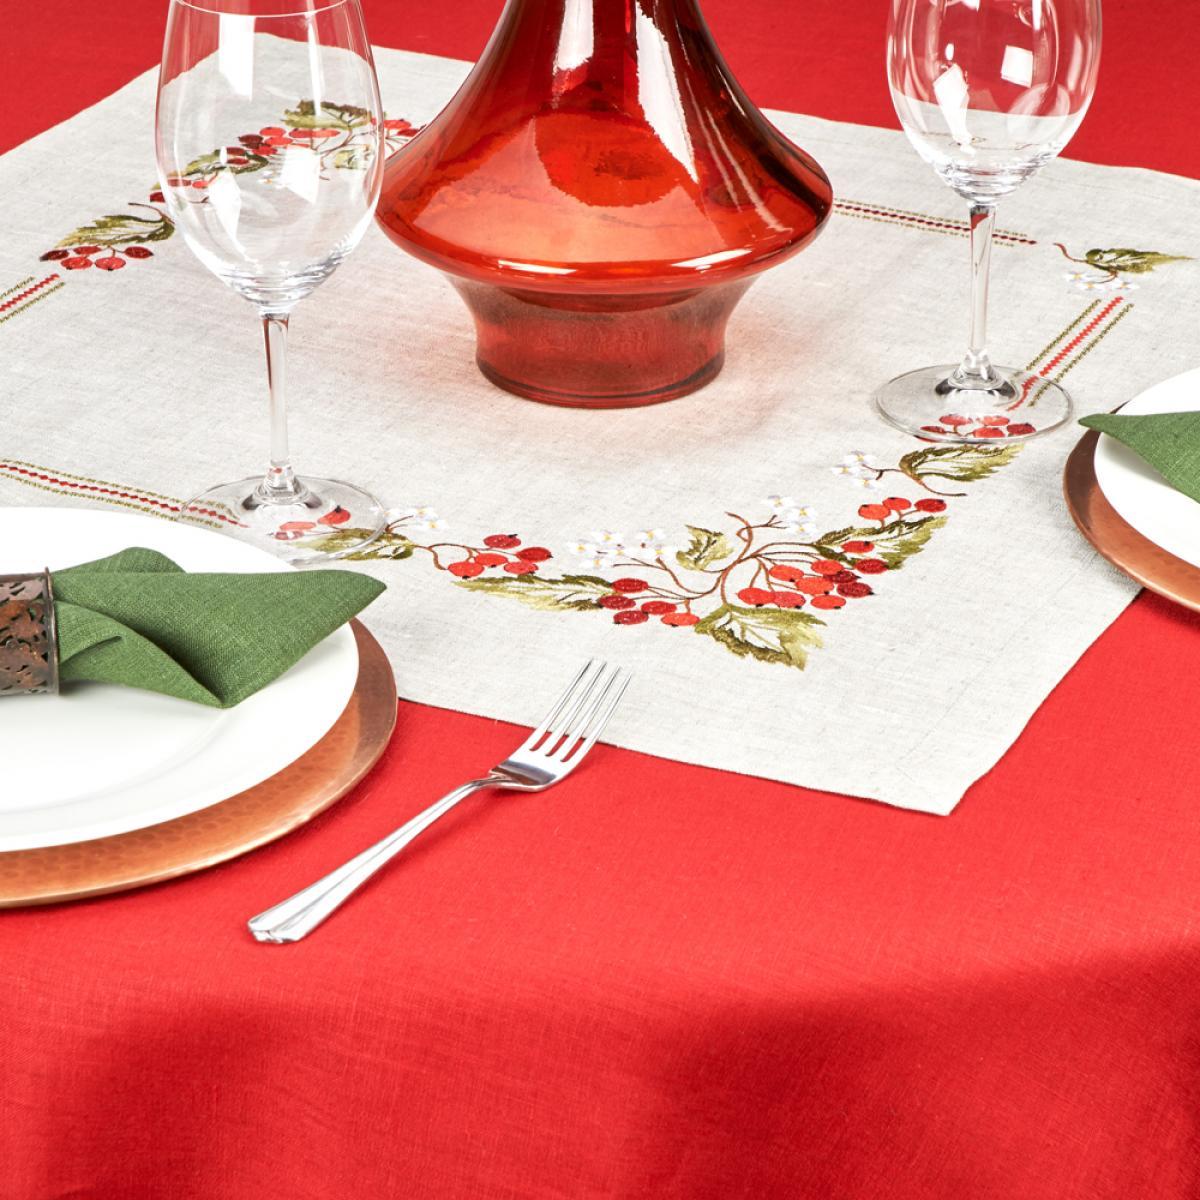 Linen tablecloth on a table Viburnum  65 * 65